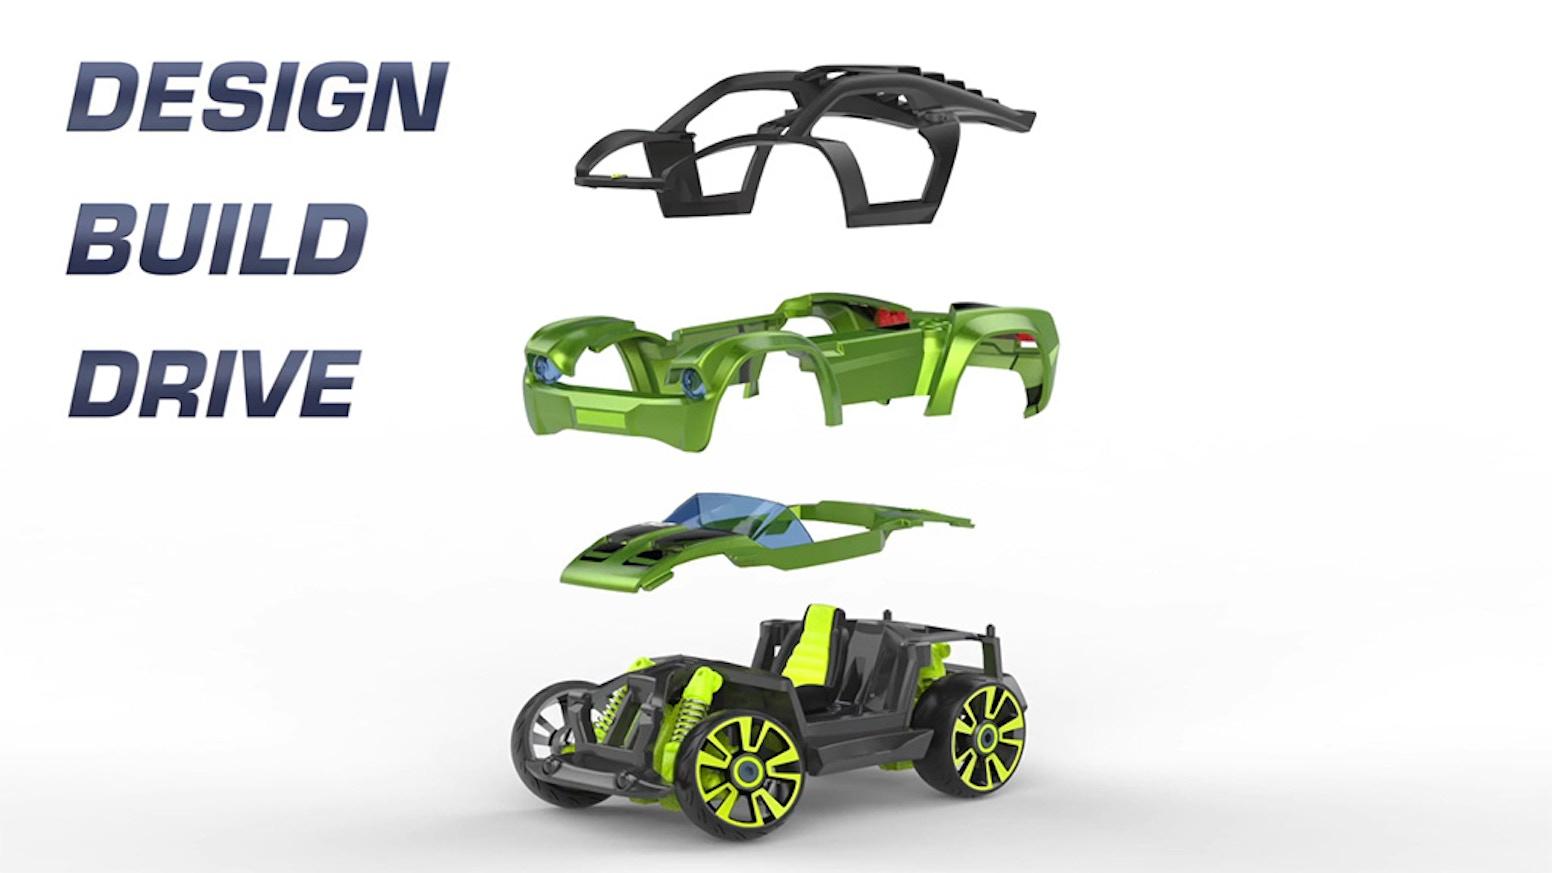 Get 2016 Family's Choice Award and Popular Science Best In Toy Fair Award winning play set. Modarri - Design, Build, Drive